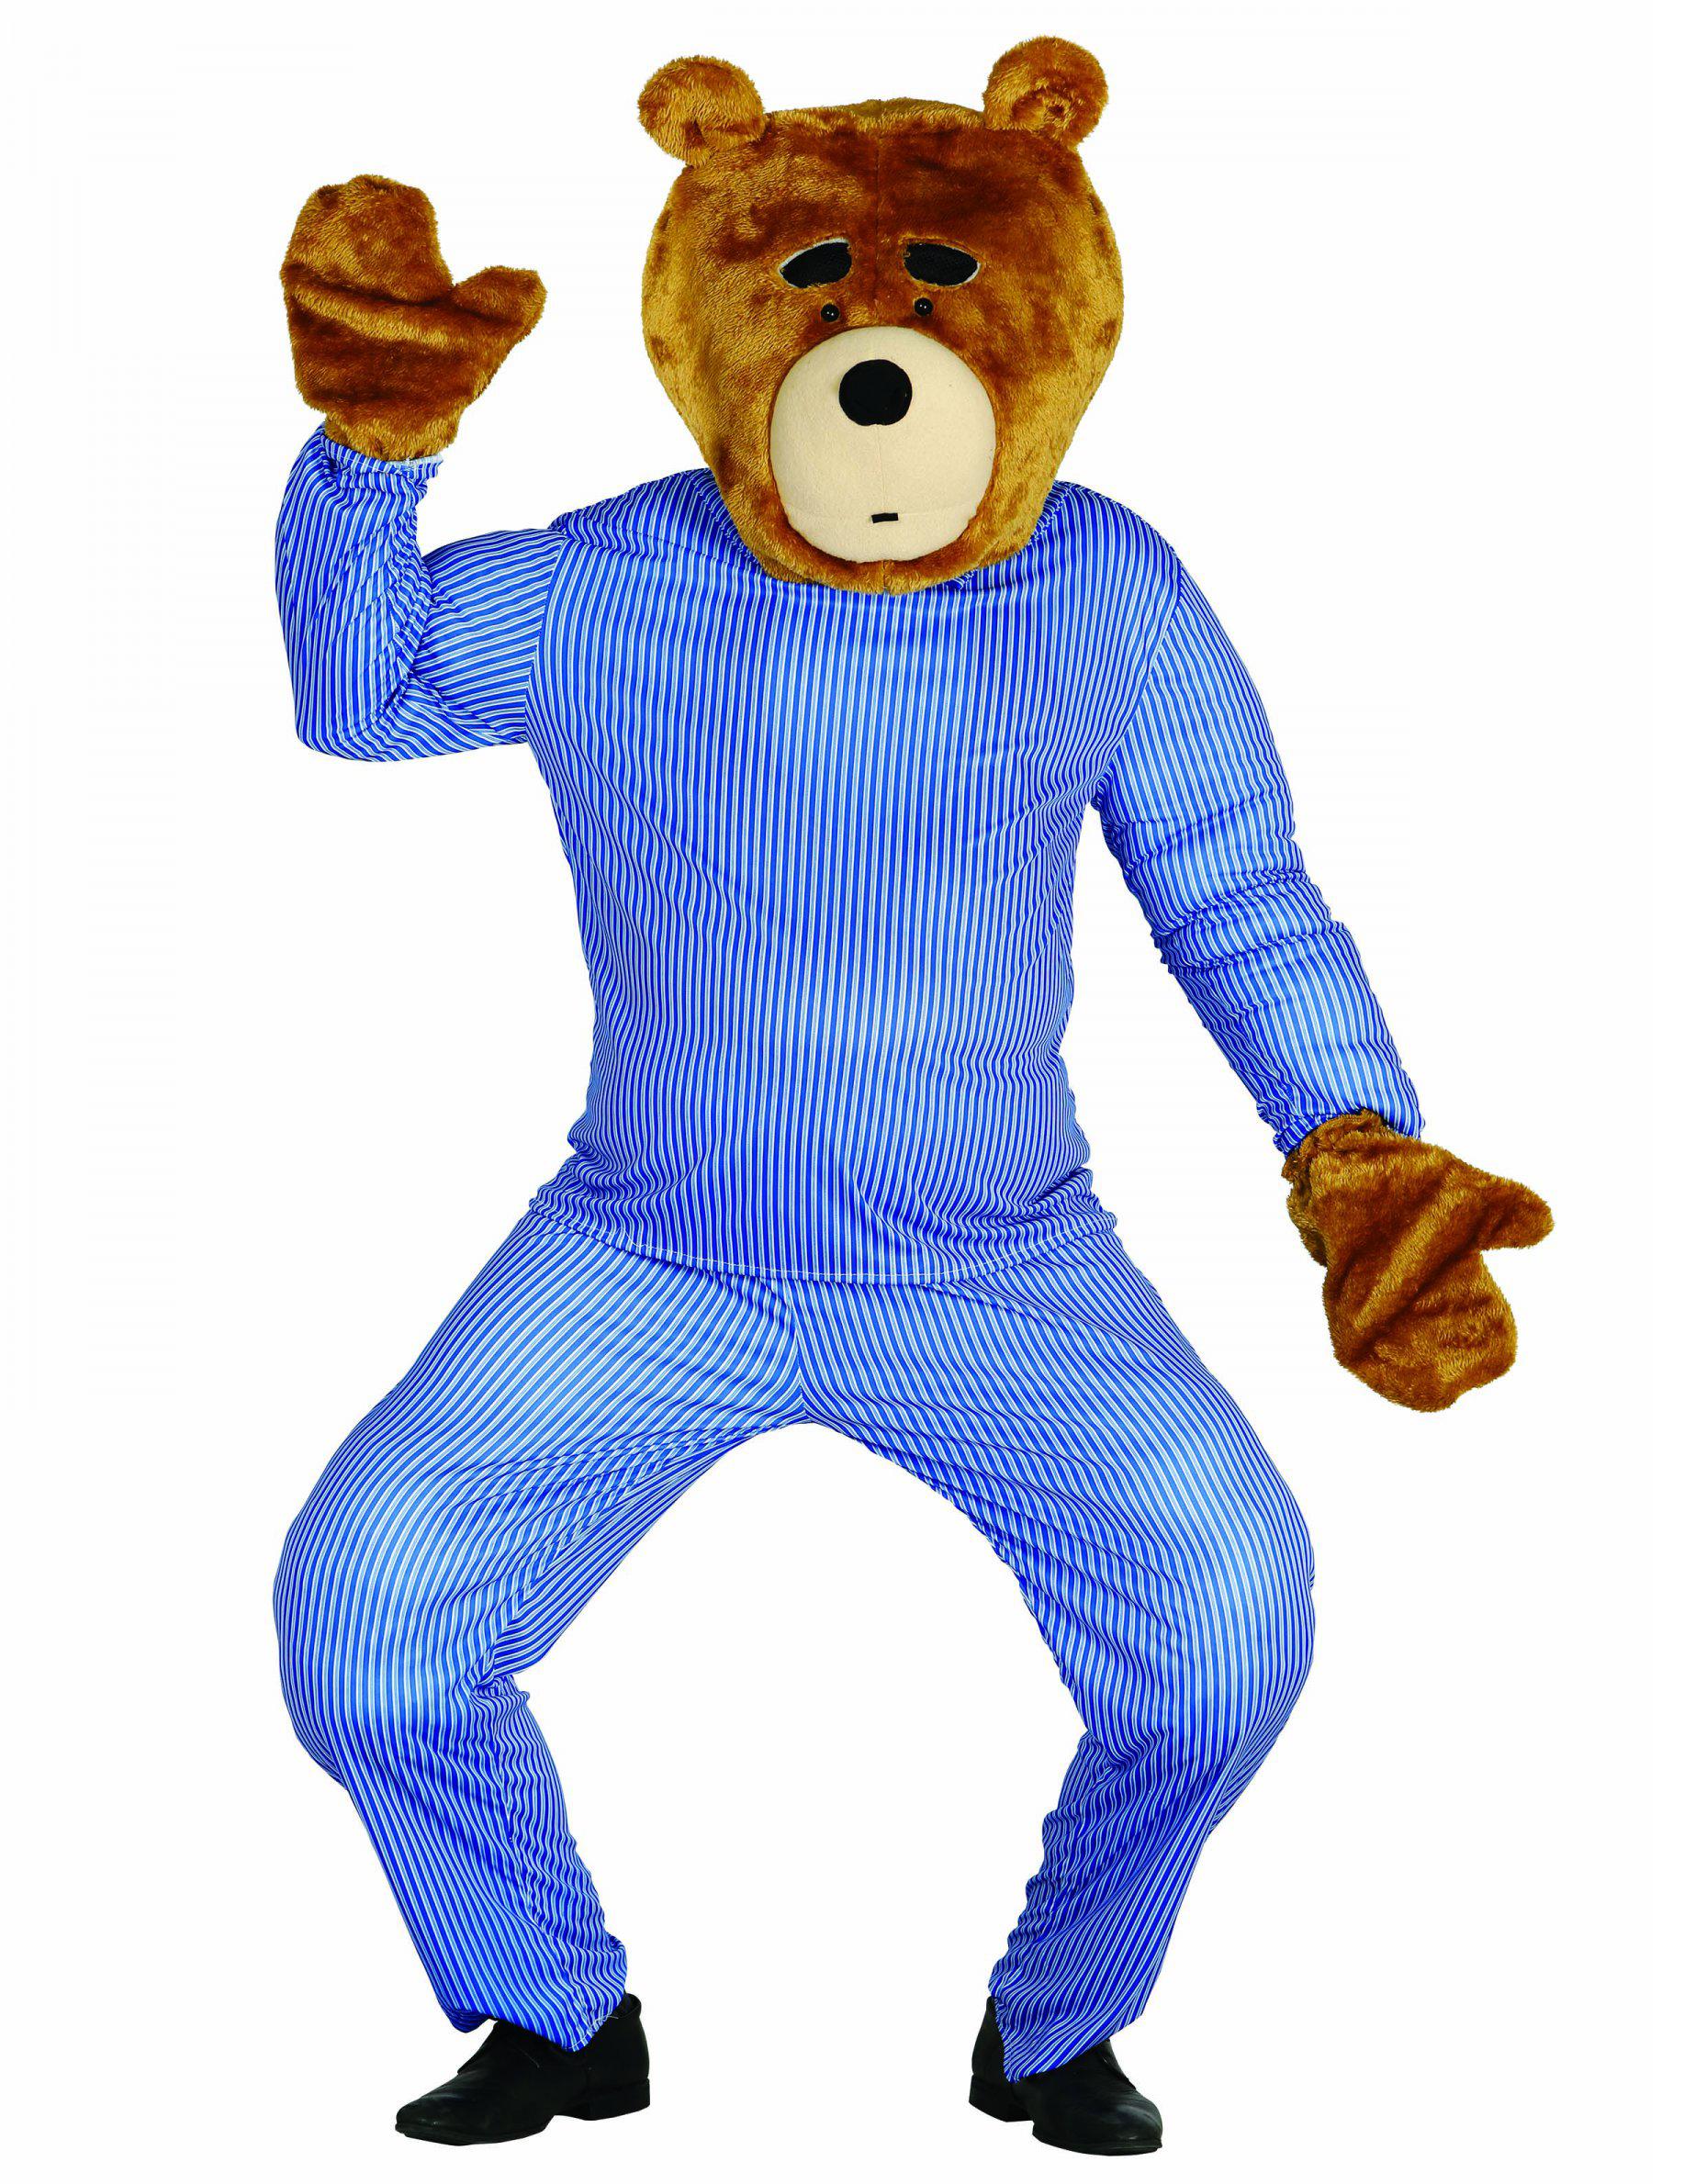 L'ours En Peluche De Jouet De Sexe - frbiguznet